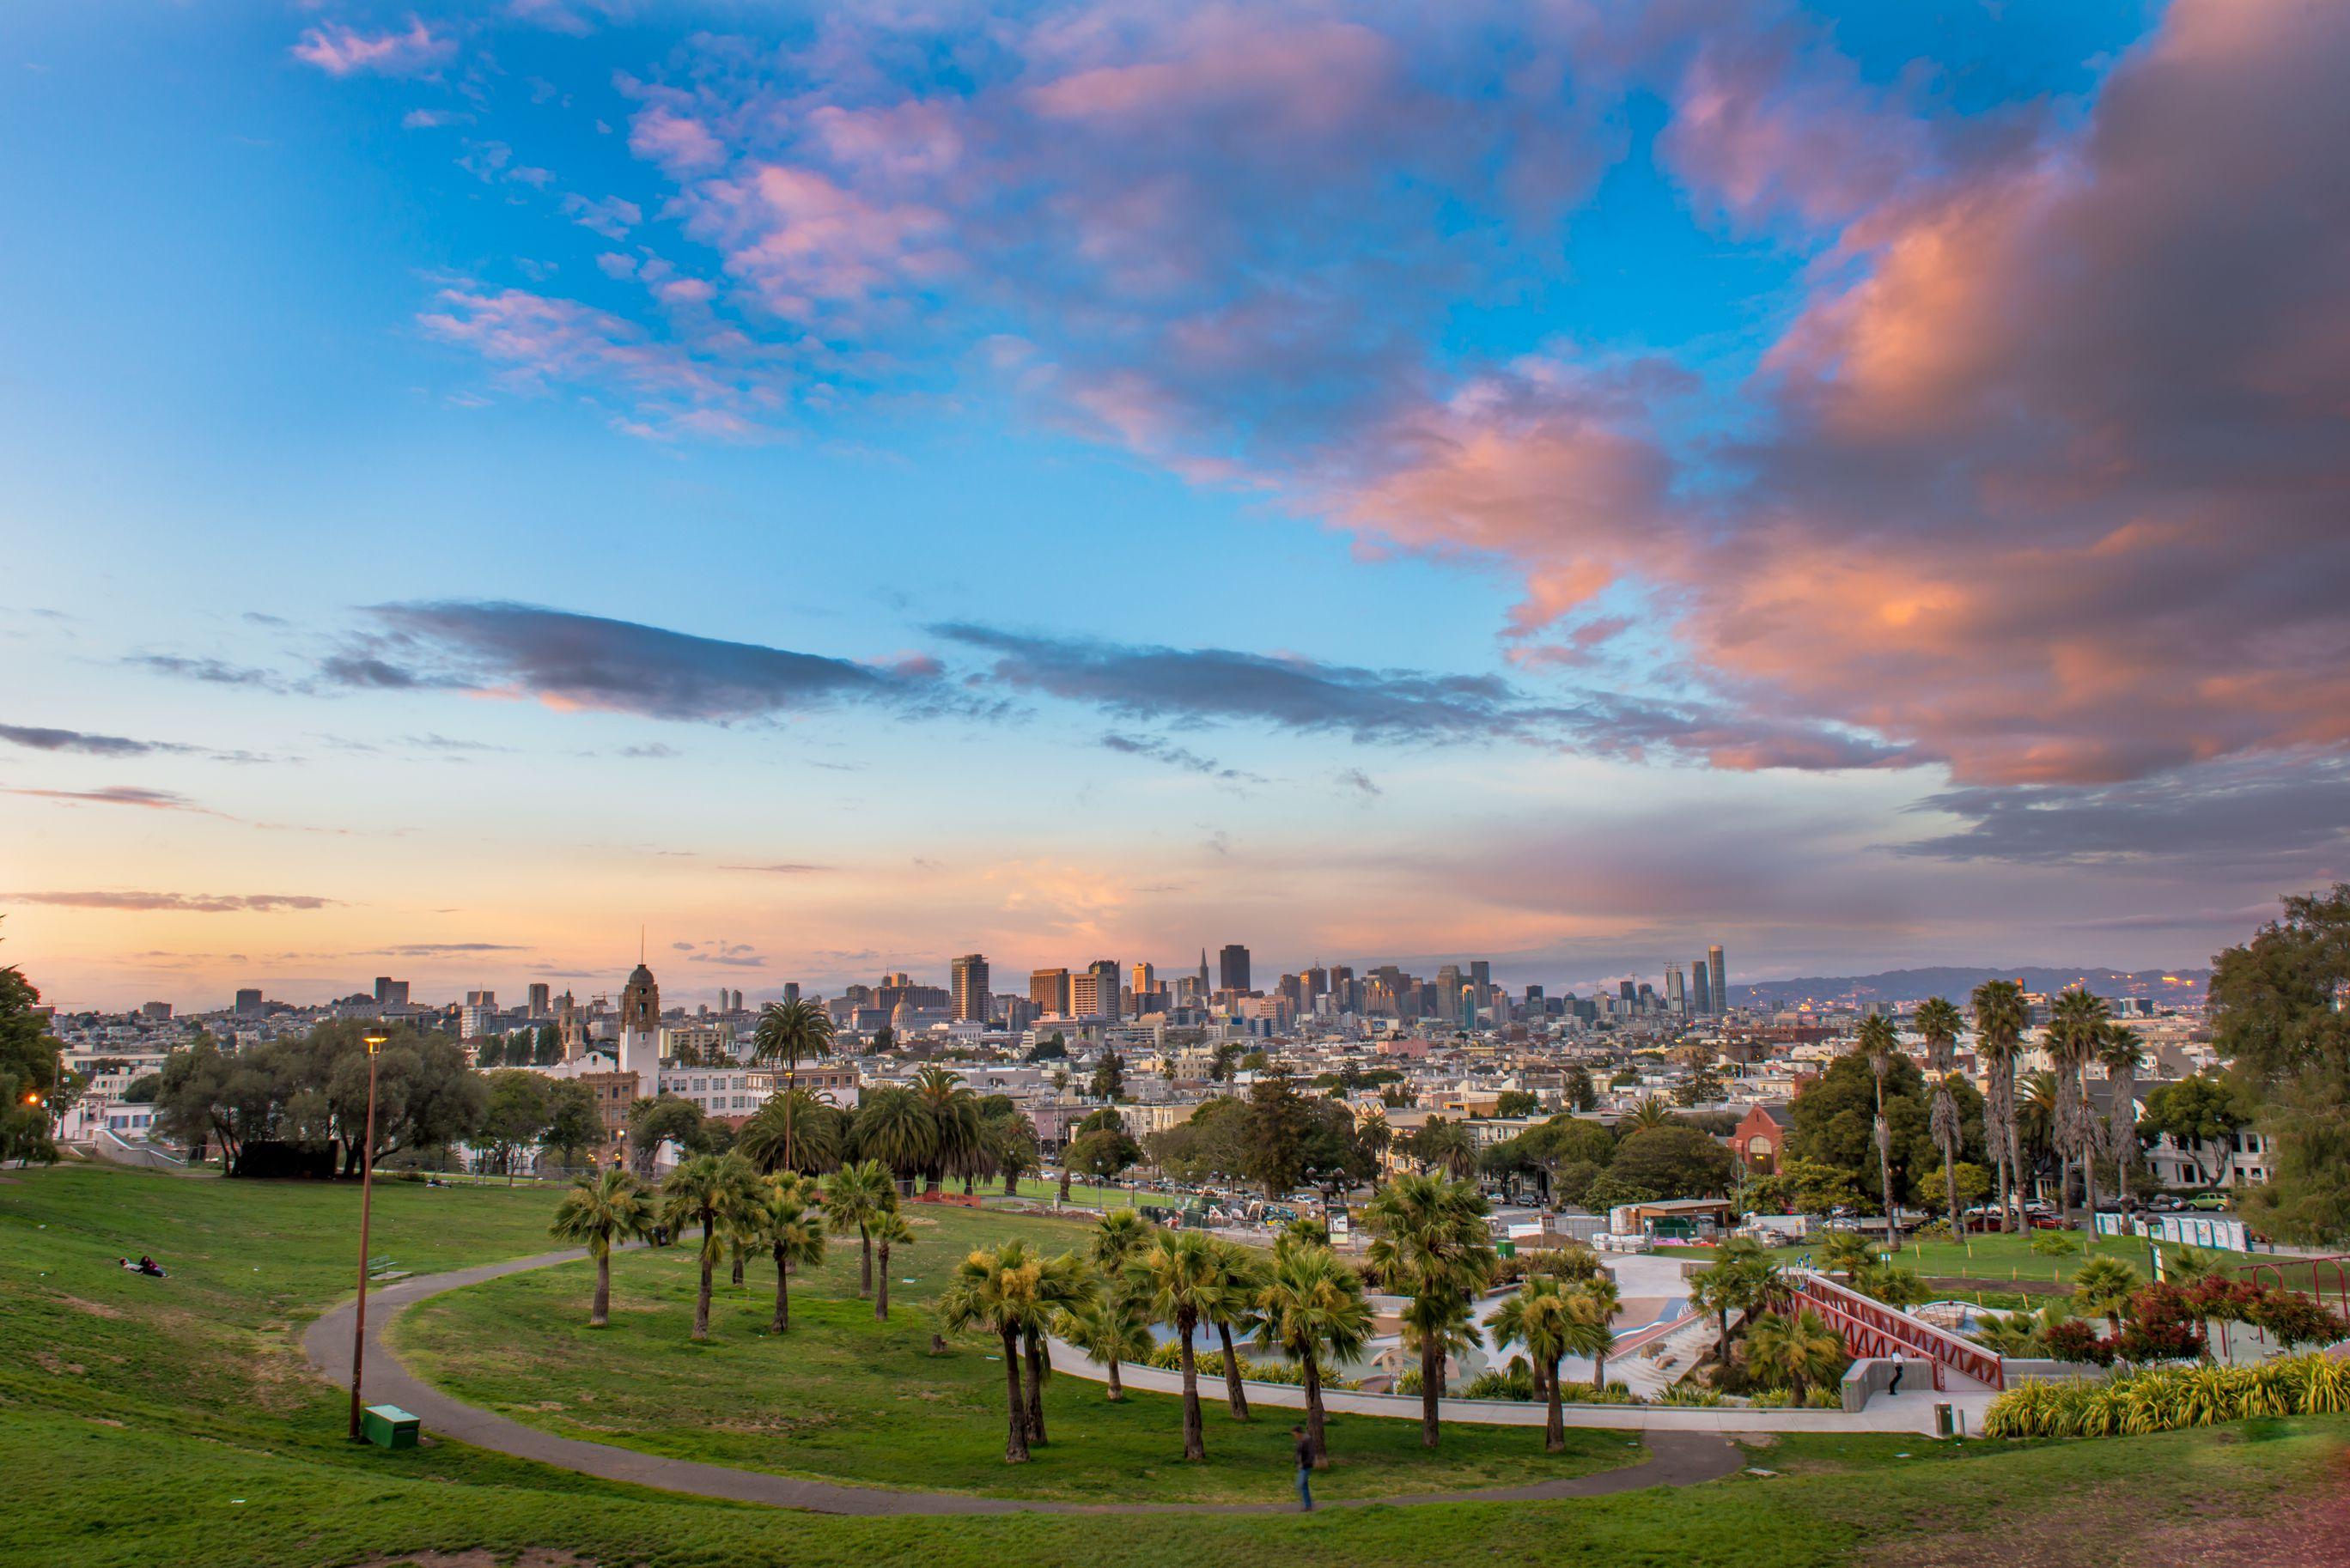 Usa Auto Insurance >> San Francisco's Beloved Mission Dolores Park